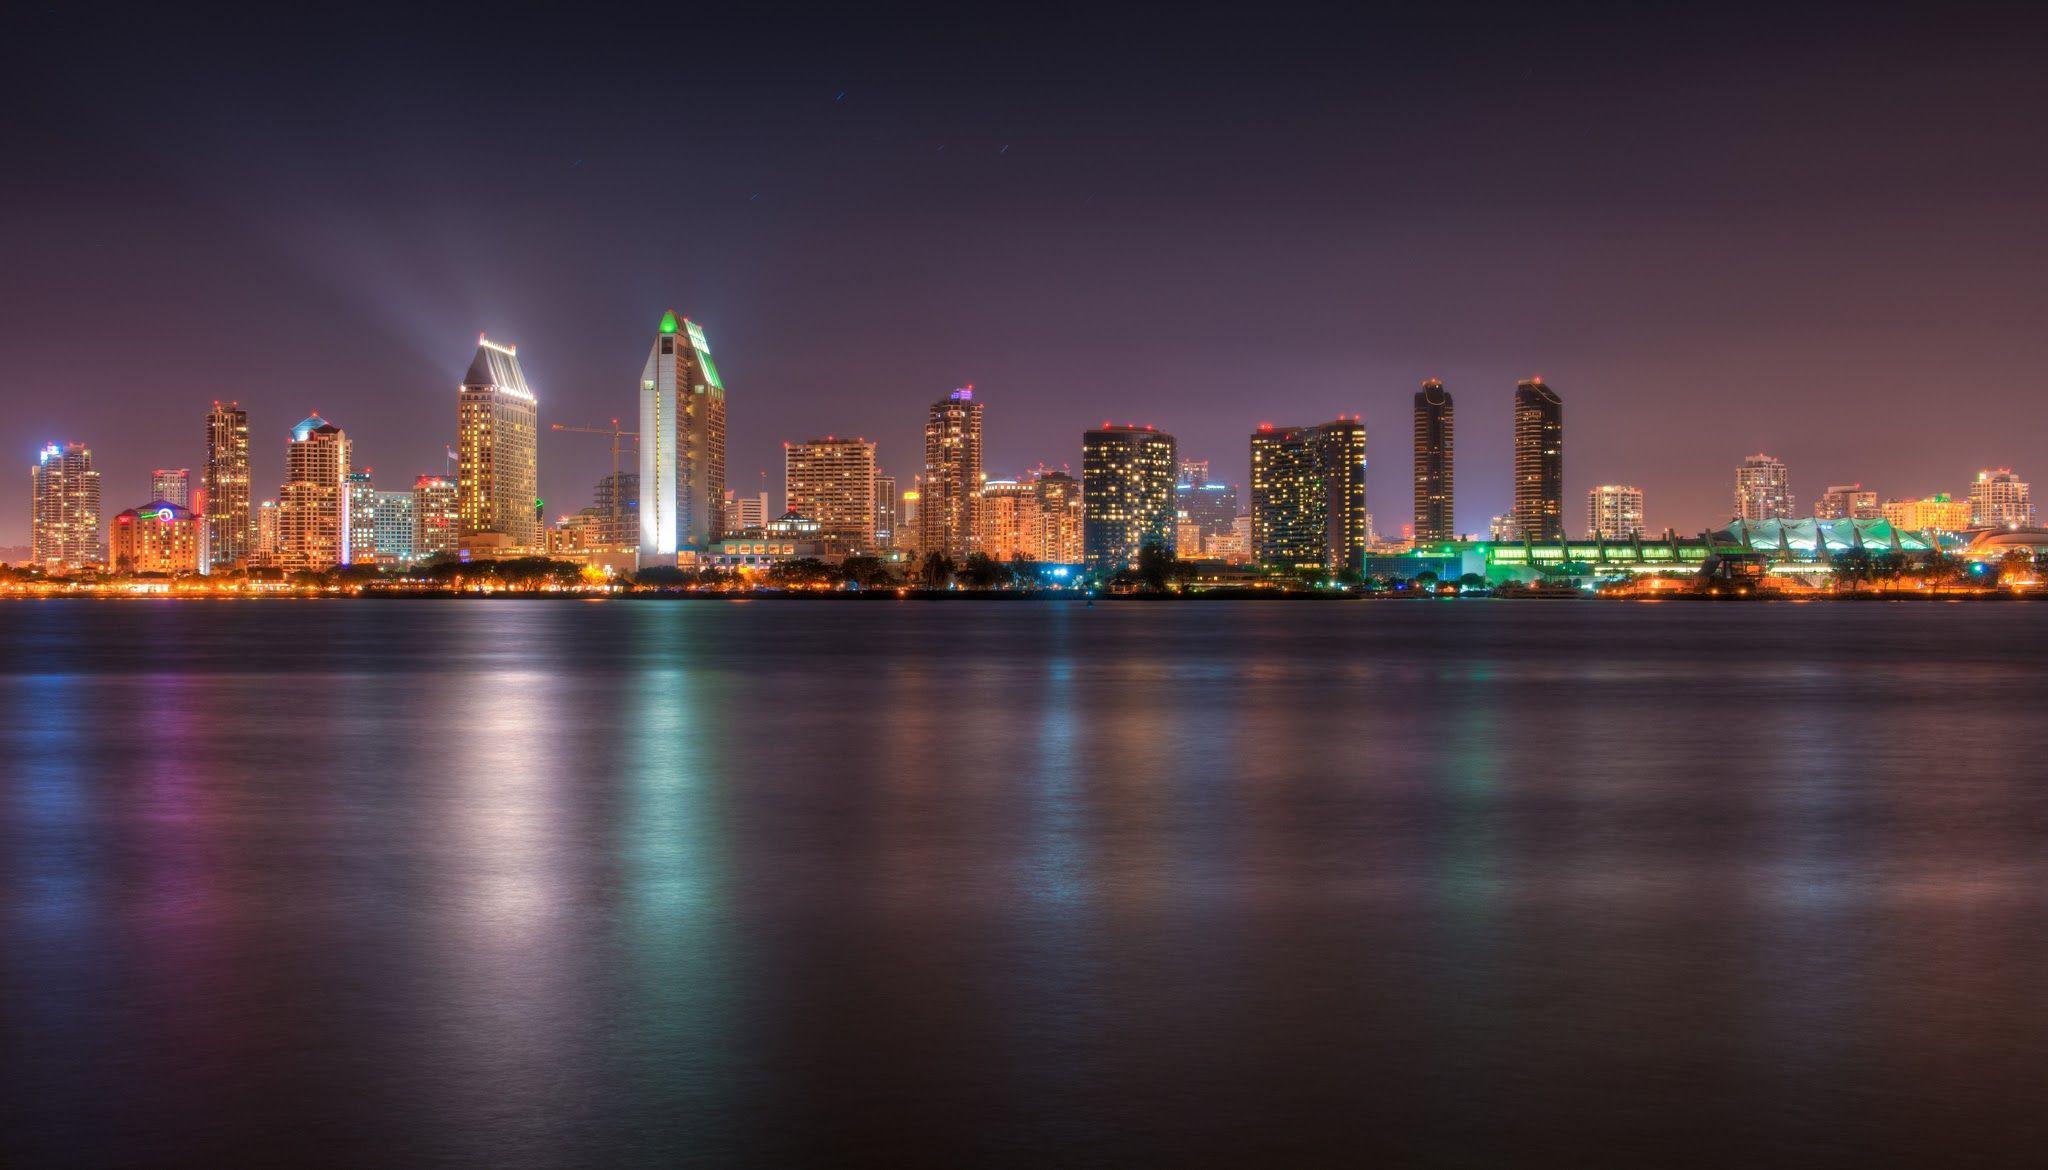 San Diego Skyline Widescreen HD Wallpaper | Recipes to ...